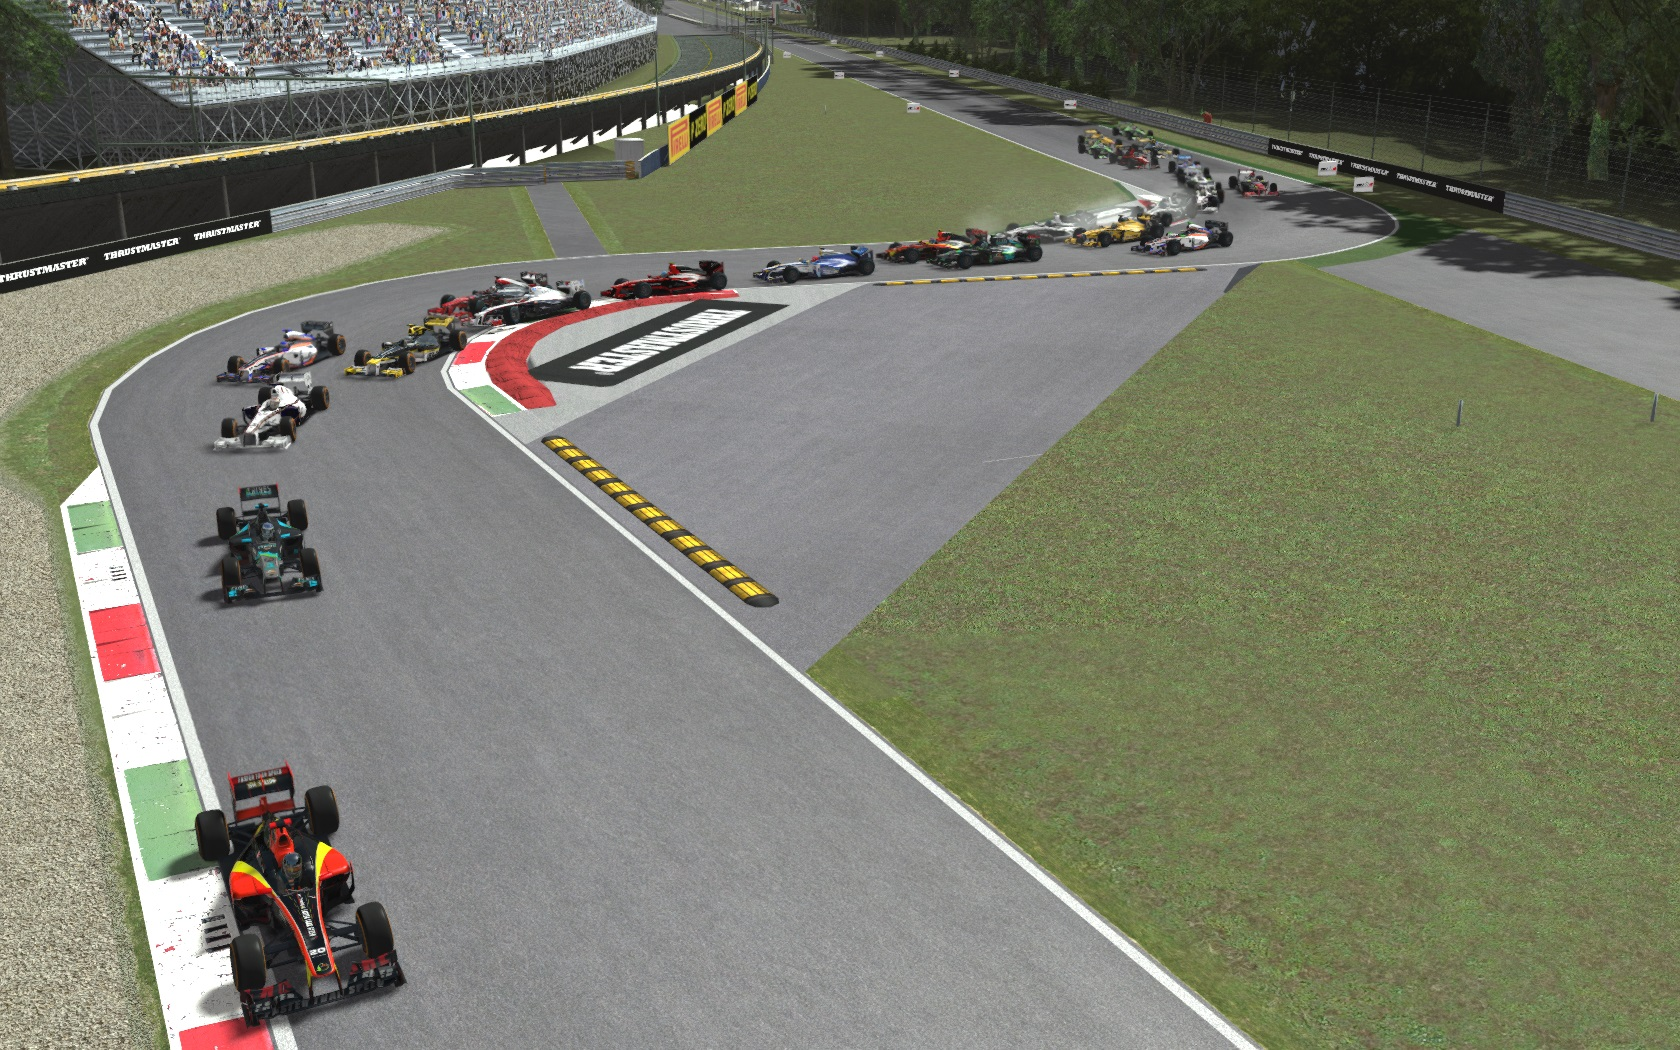 WC 2015: Italian GP Preview